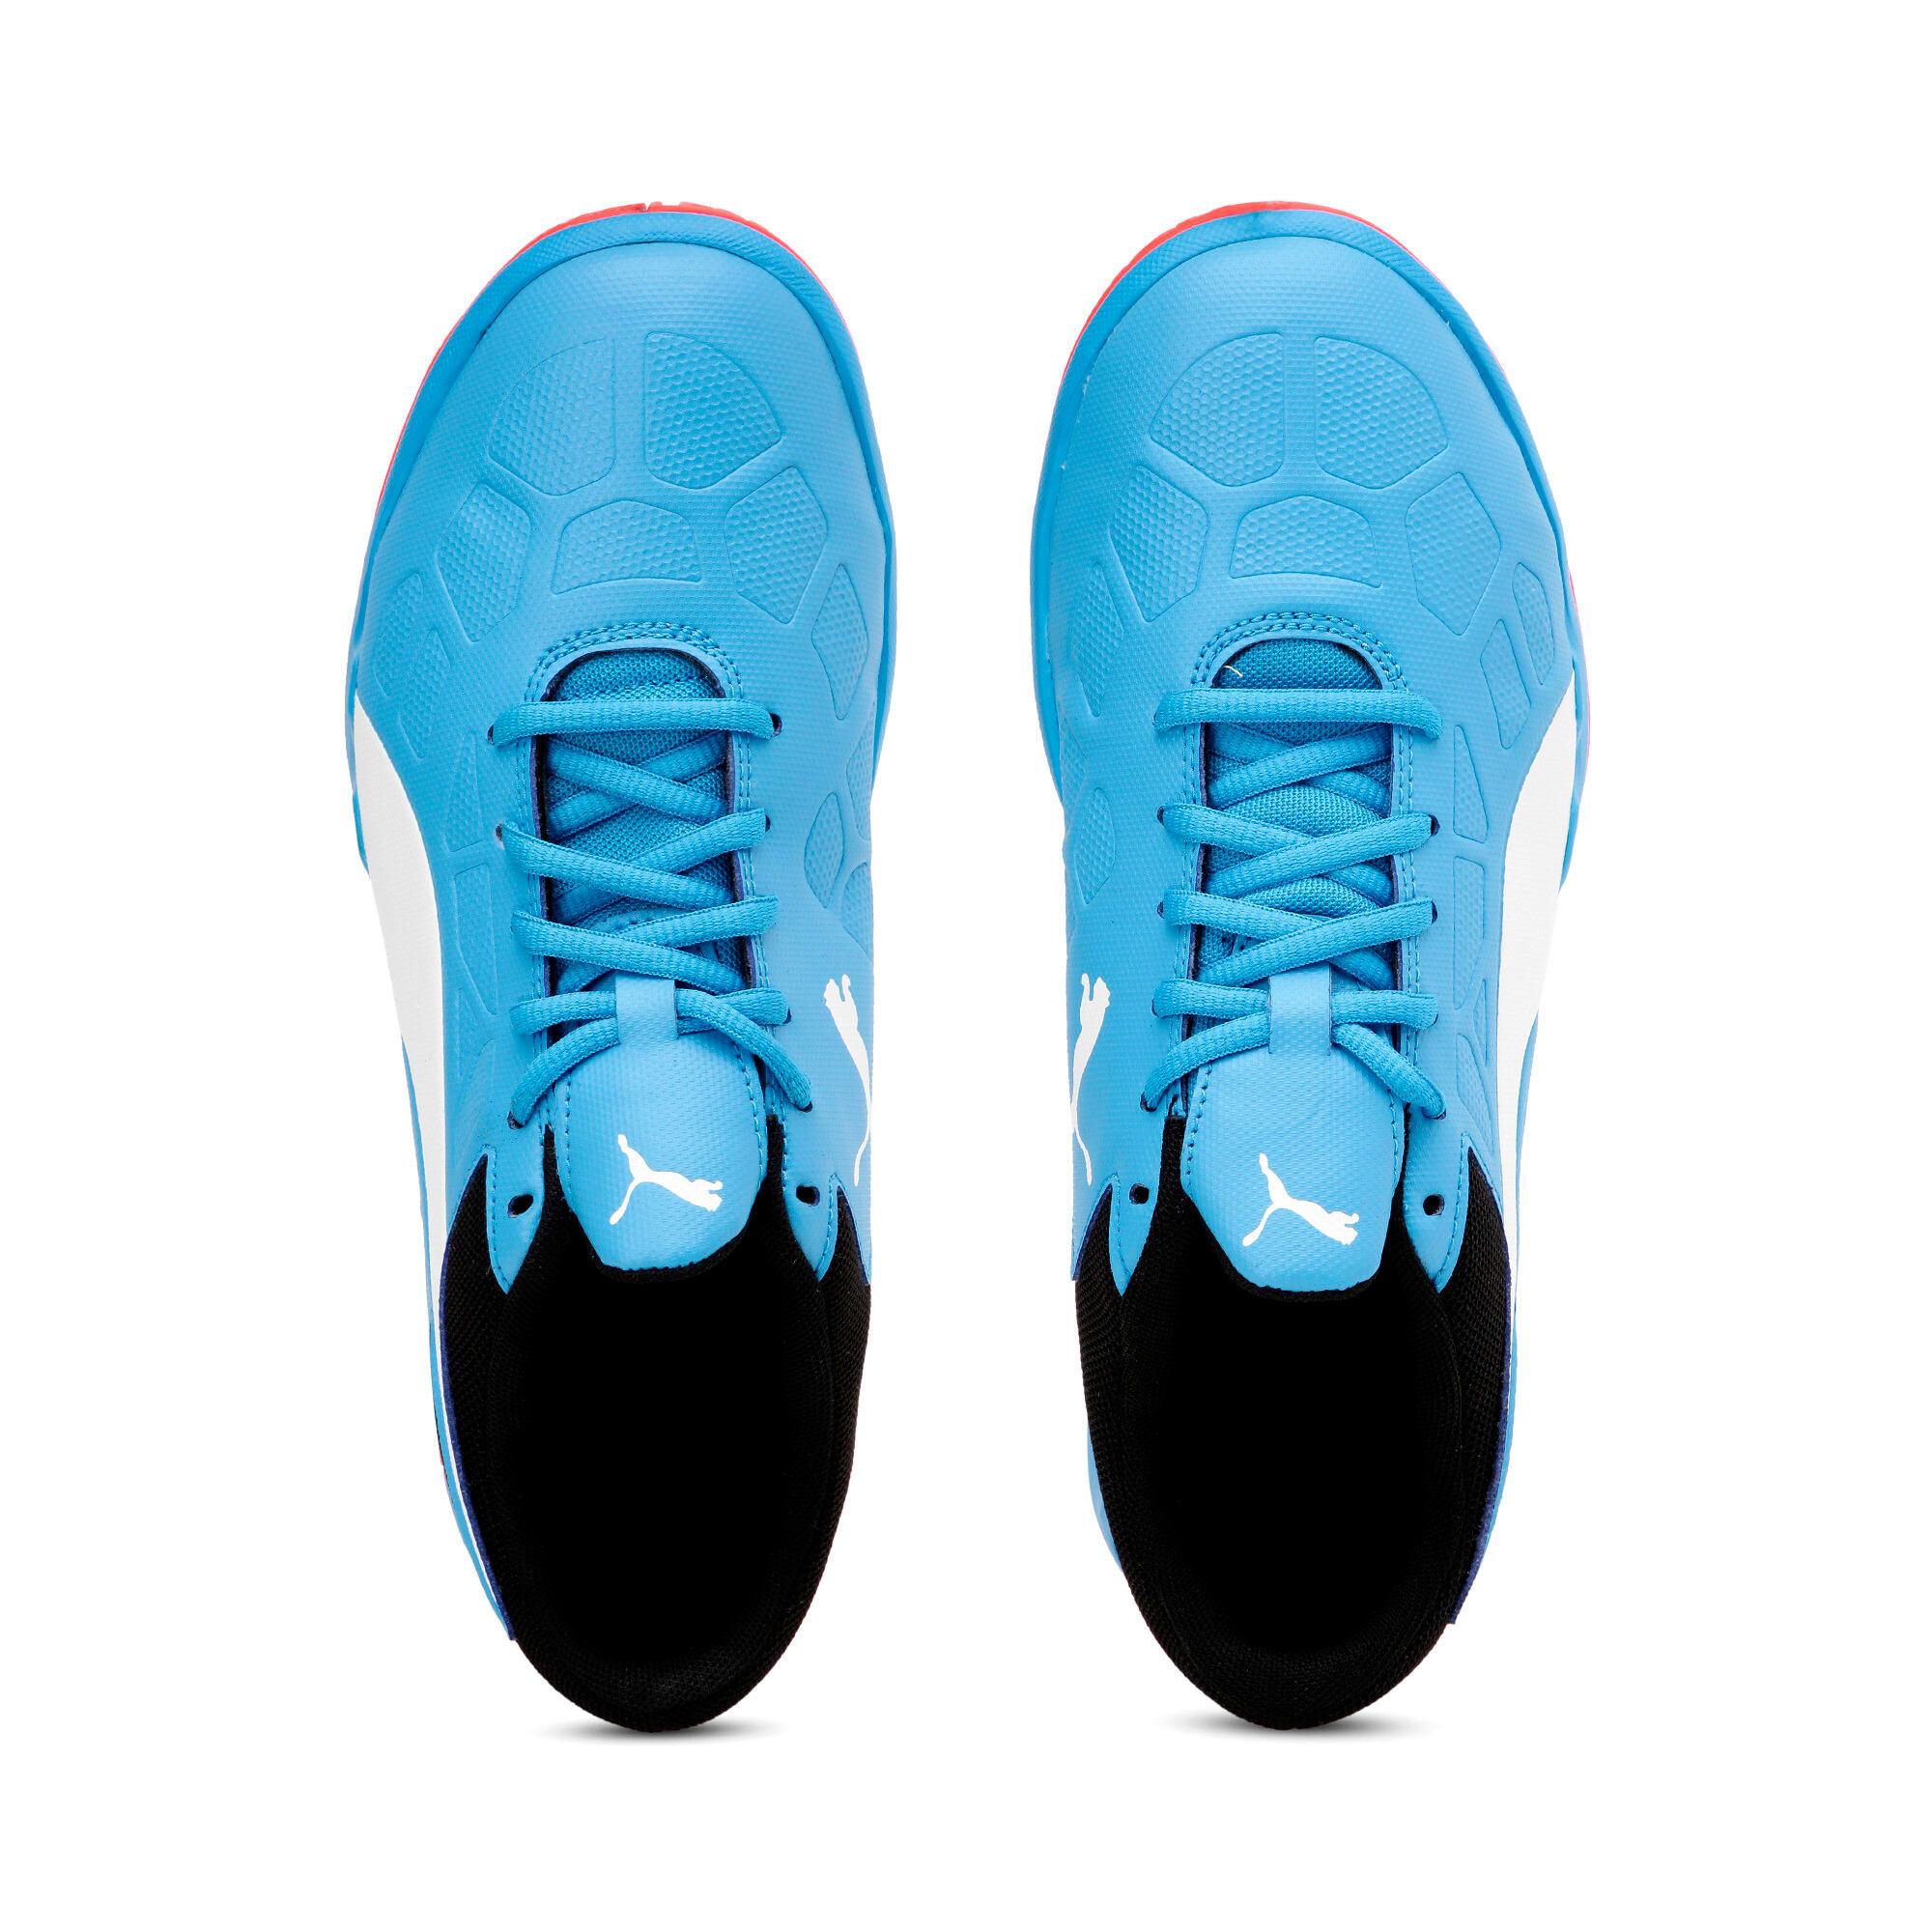 Thumbnail 6 of Tenaz Kids' Indoor Teamsport Shoes, Bleu Azur-White-Black-Red, medium-IND